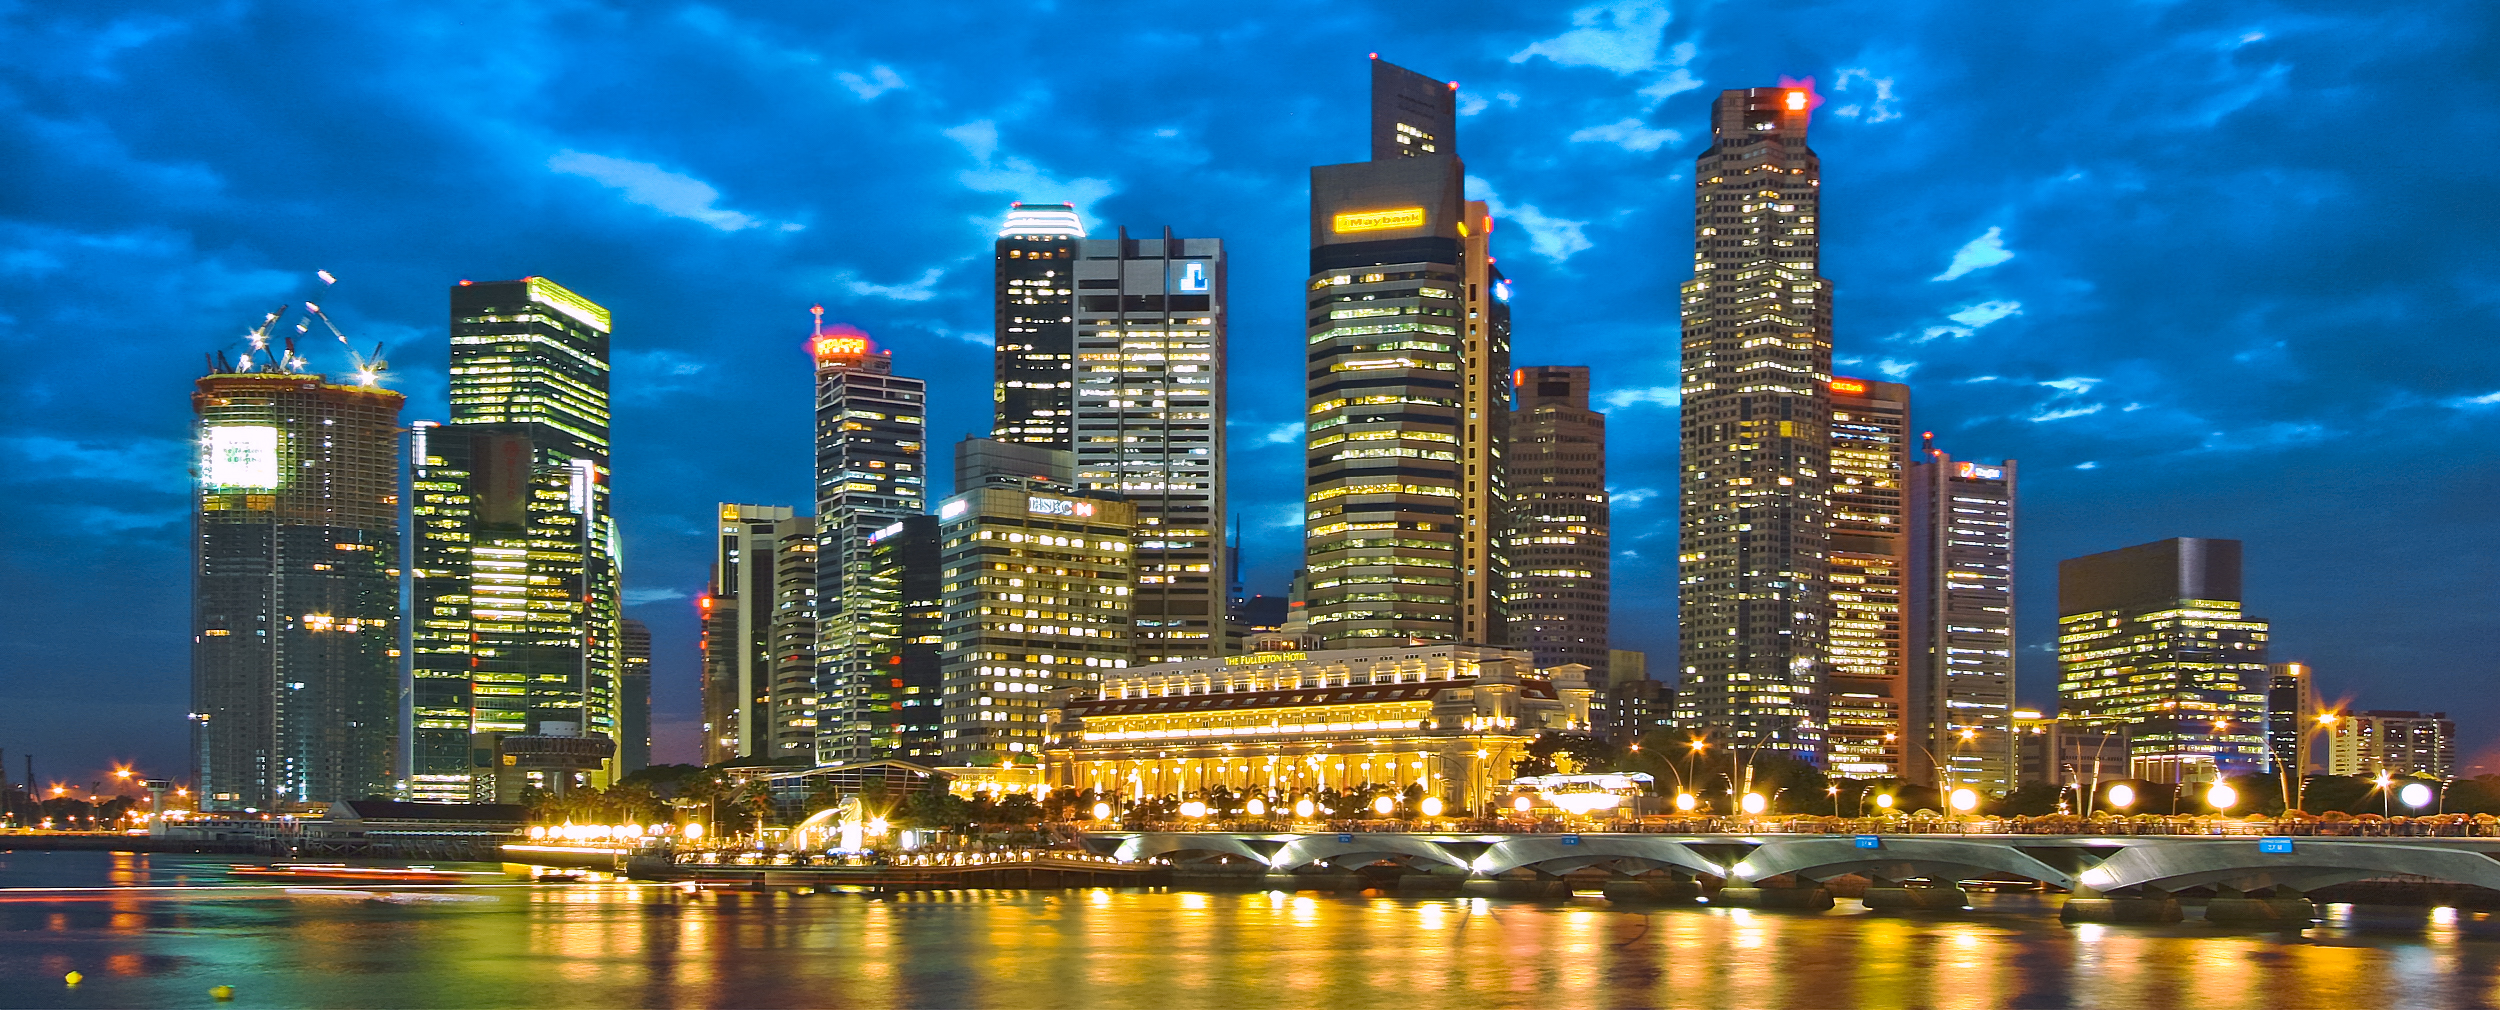 Singapore | Media Hub of SE Asia